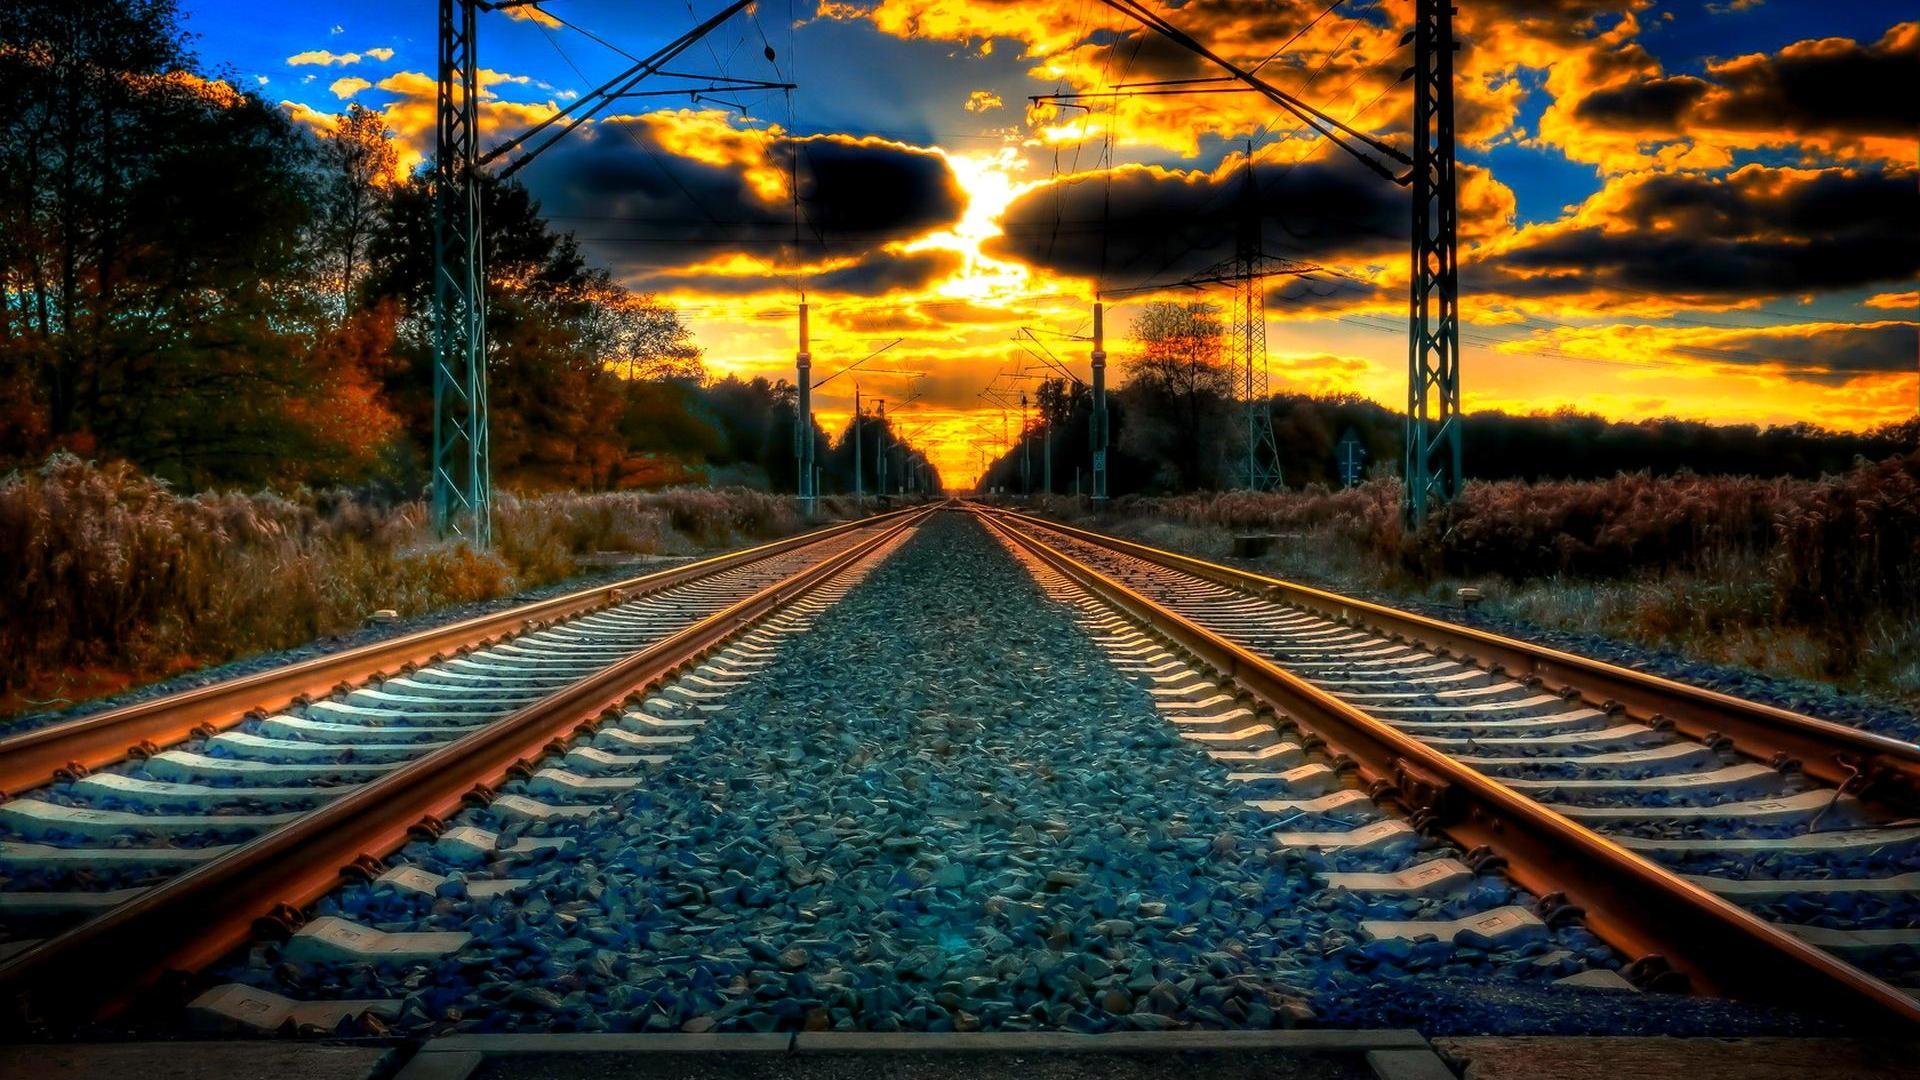 RAILWAY TRACK to HORIZON